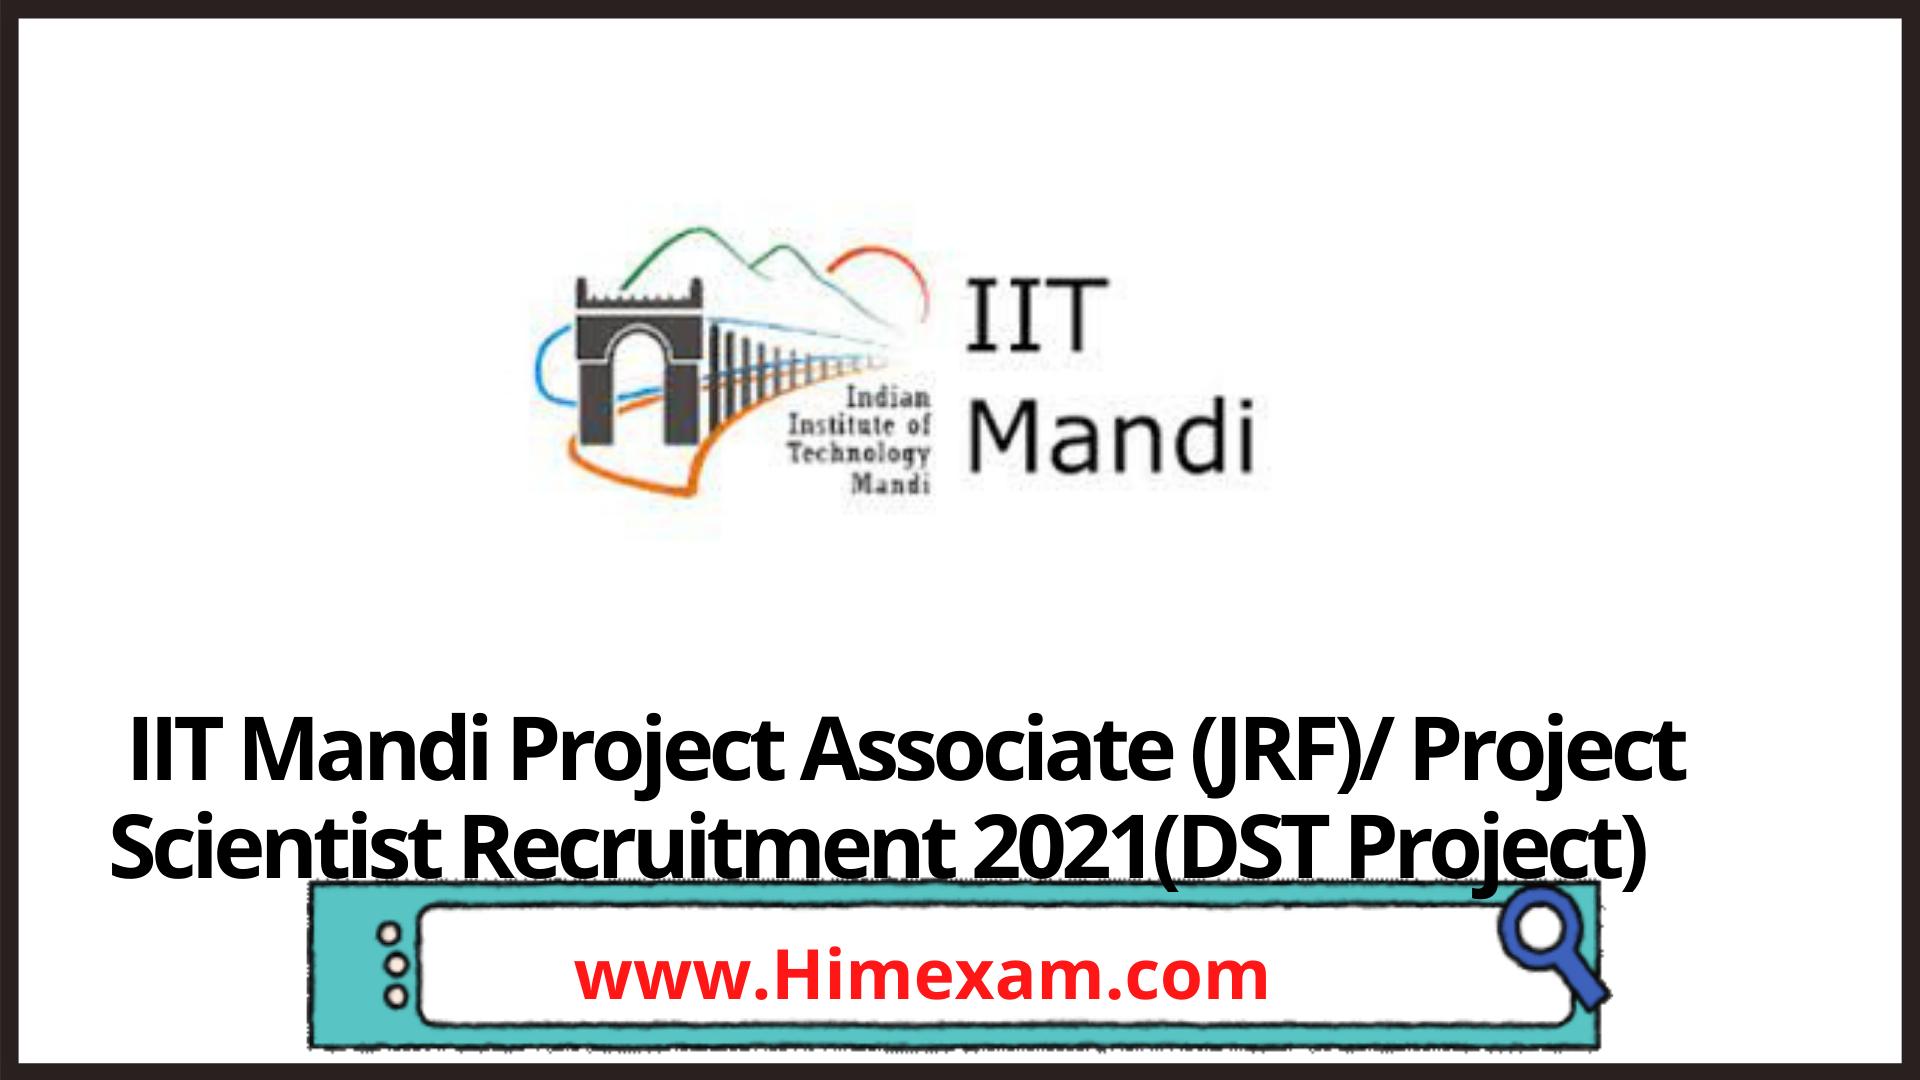 IIT Mandi Project Associate (JRF)/ Project Scientist Recruitment 2021(DST Project)